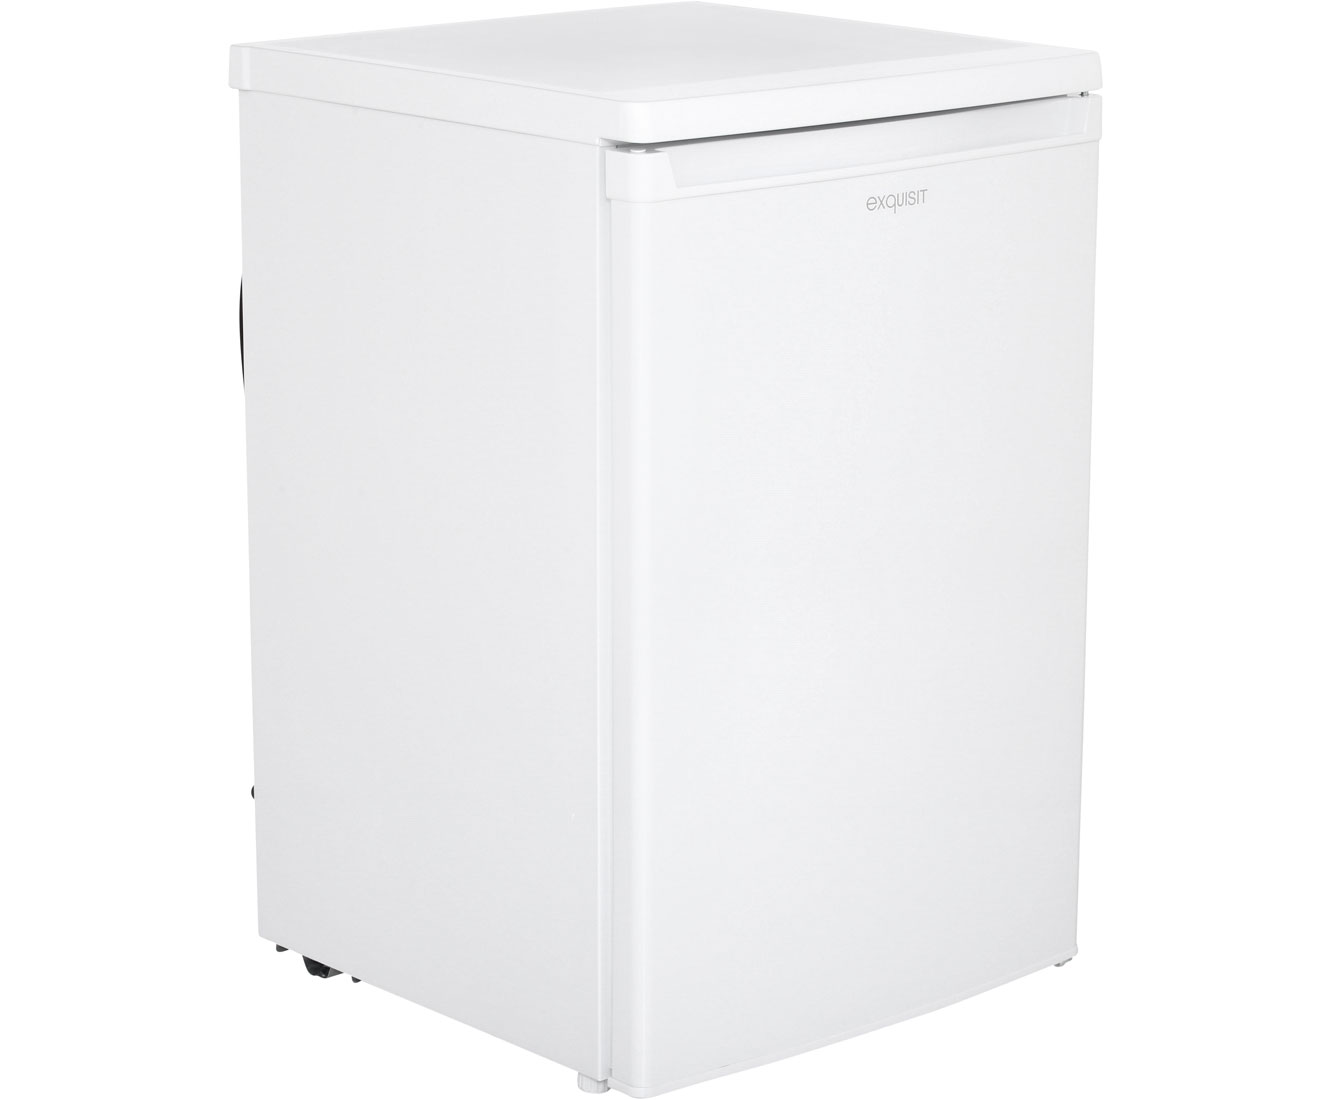 Aeg Kühlschrank Laut : Aeg kühlschrank zu laut: kühlschrank blubbert laut lisa brasel